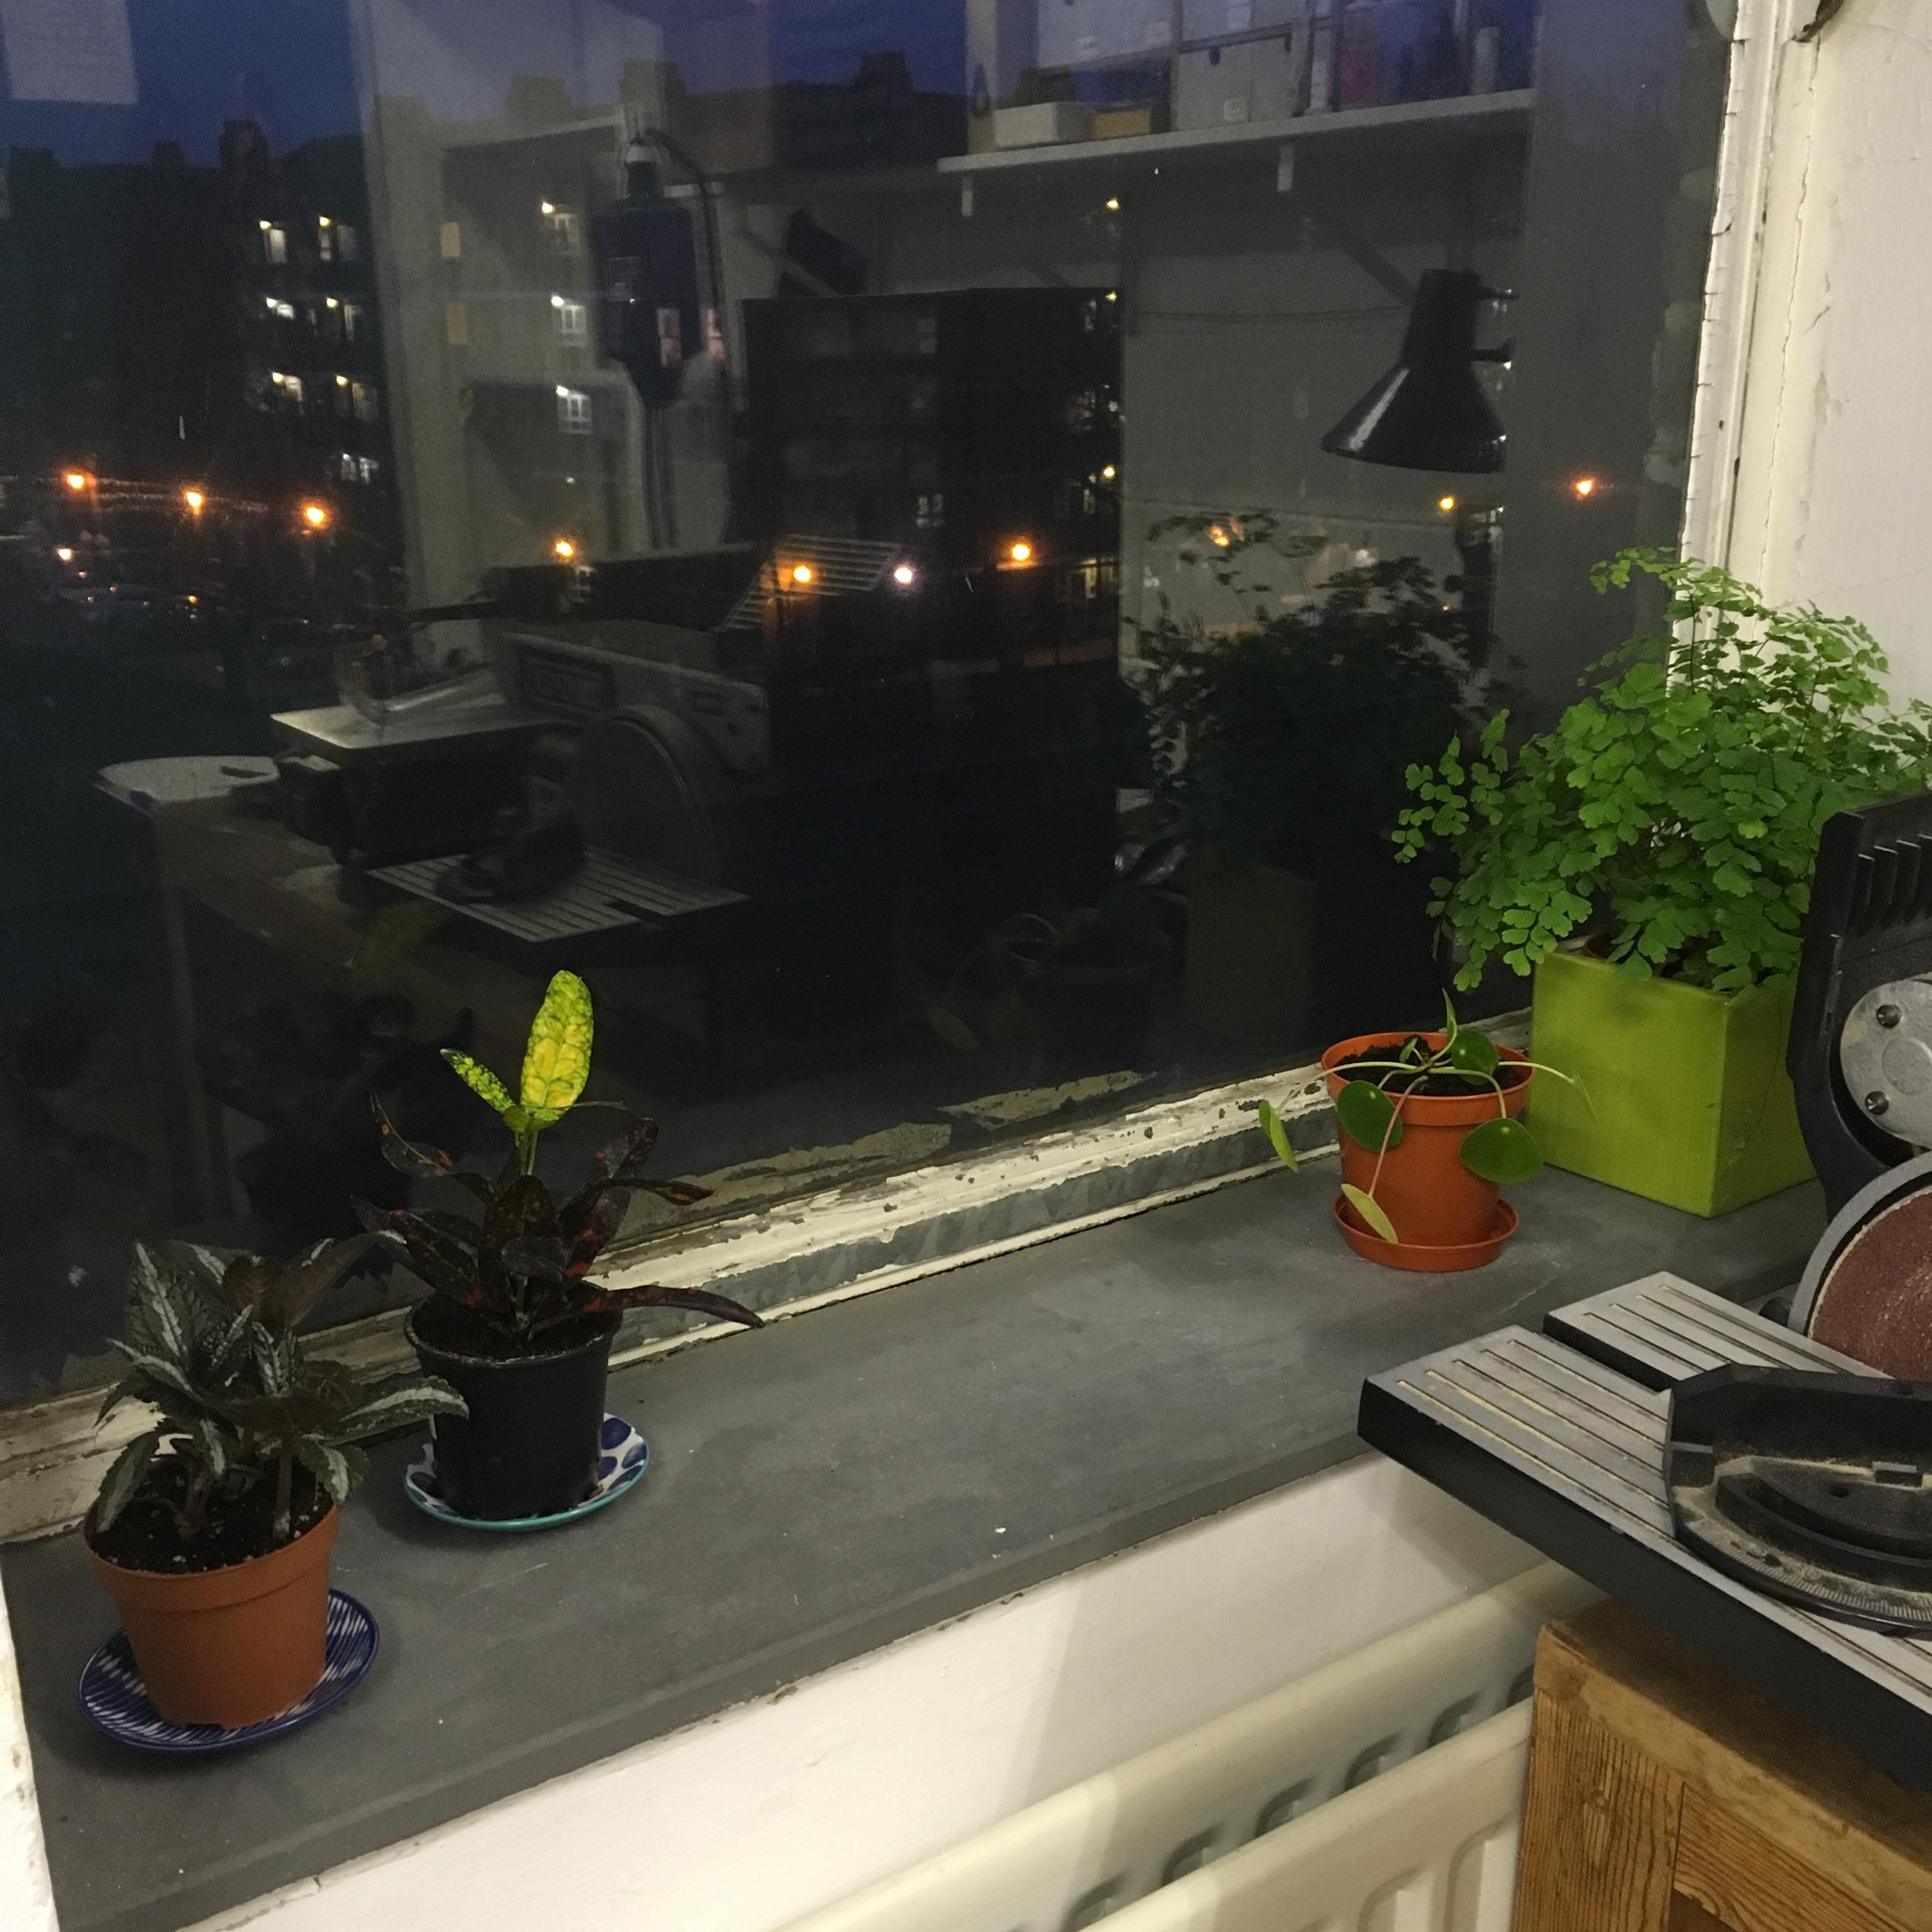 Plants on the window sill.